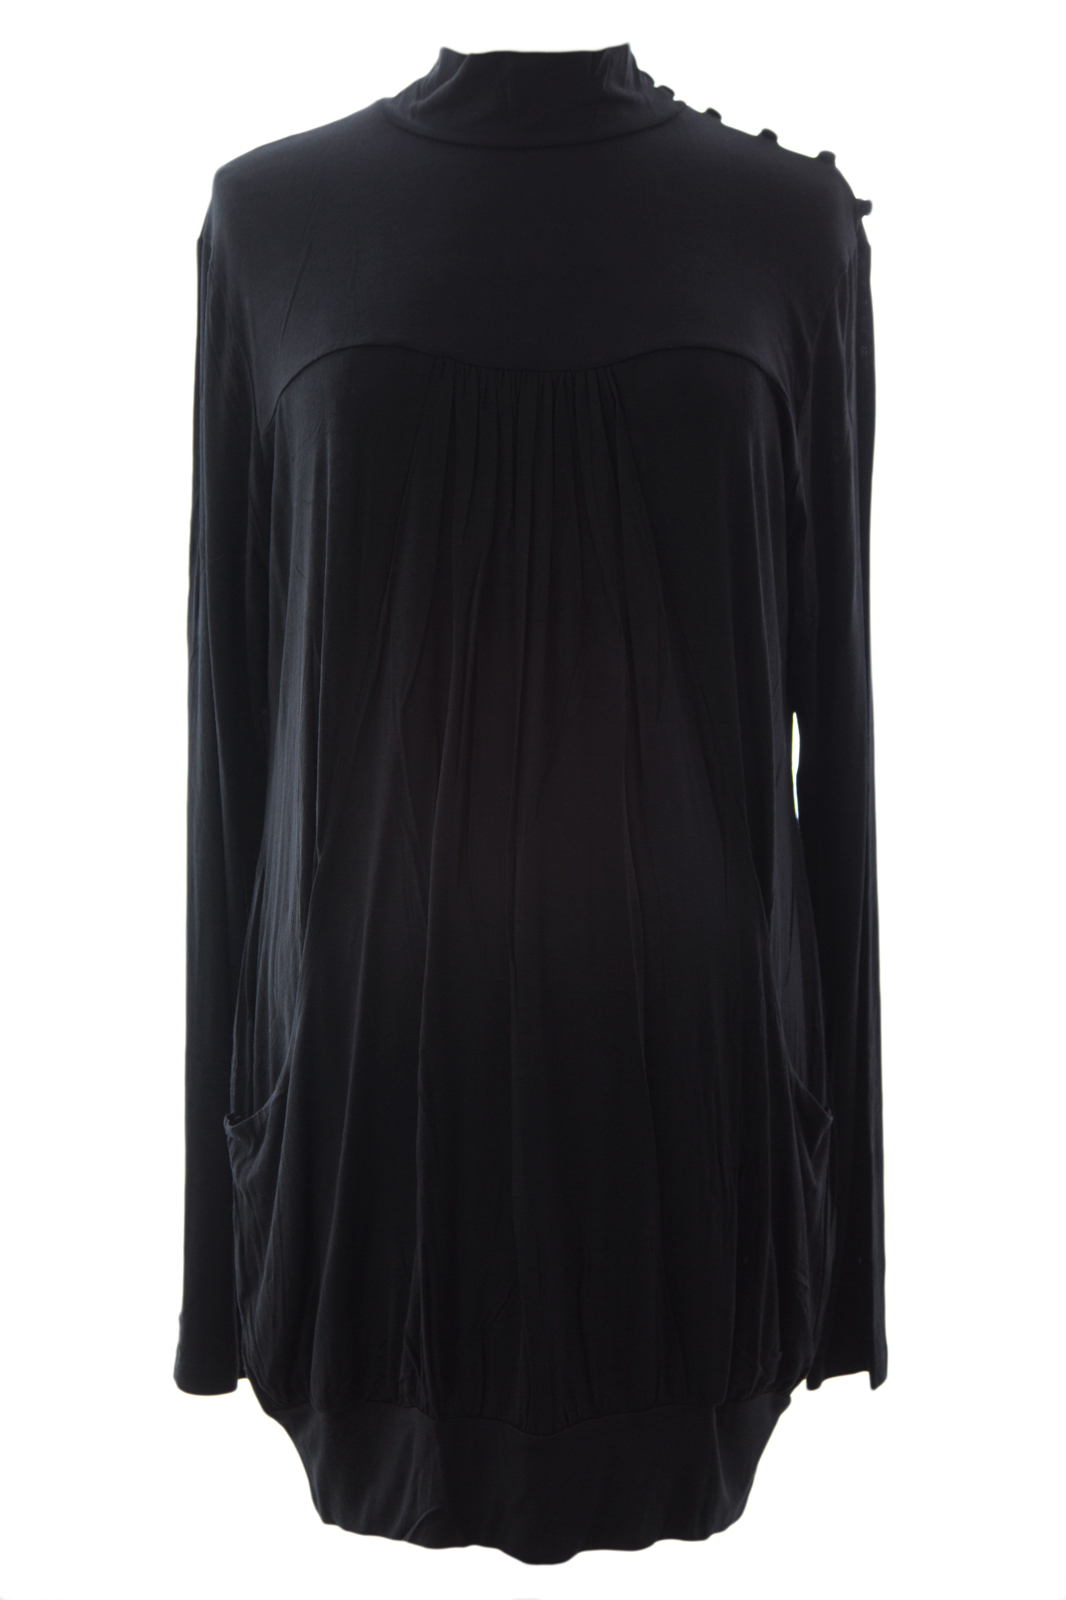 OLIAN Maternity Women's Front Pocket Mock Neck Tunic Top